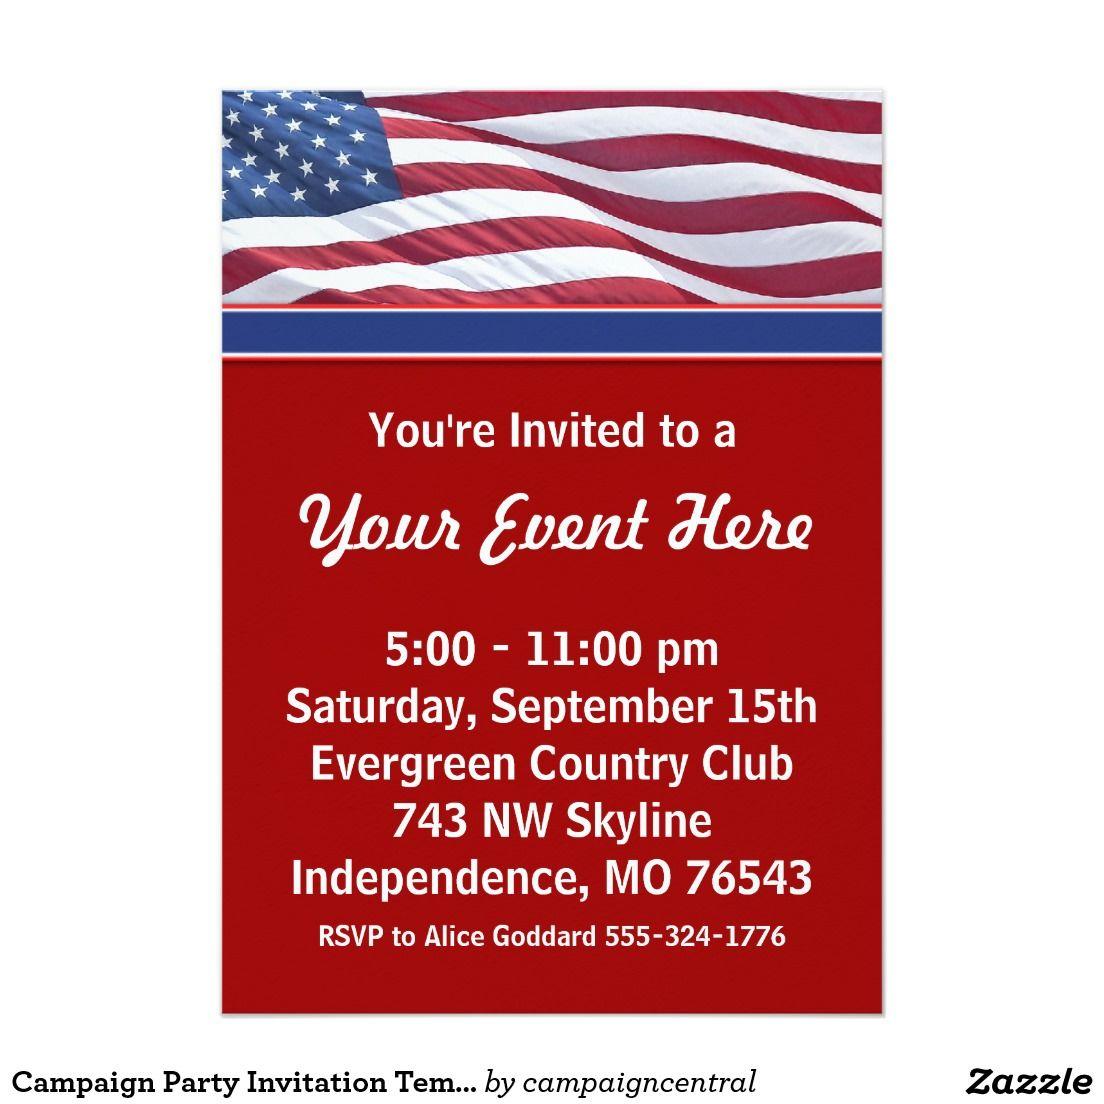 Campaign Party Invitation Template | Pinterest | Party invitation ...